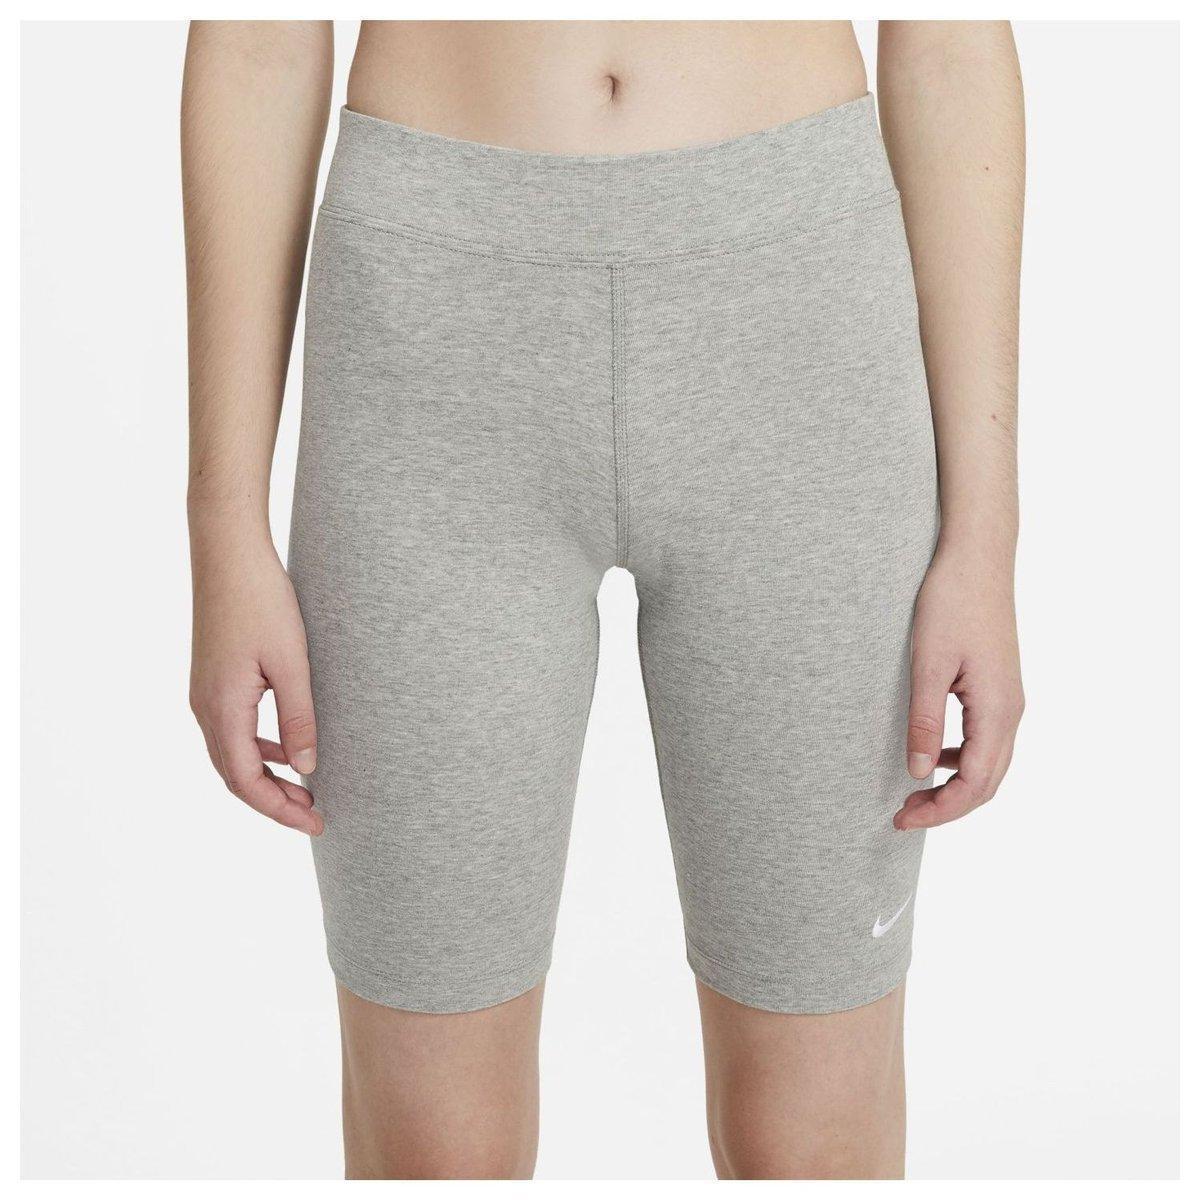 Велошорты женские Nike Sportswear Essential Bike Shorts CZ8526-063 Серый